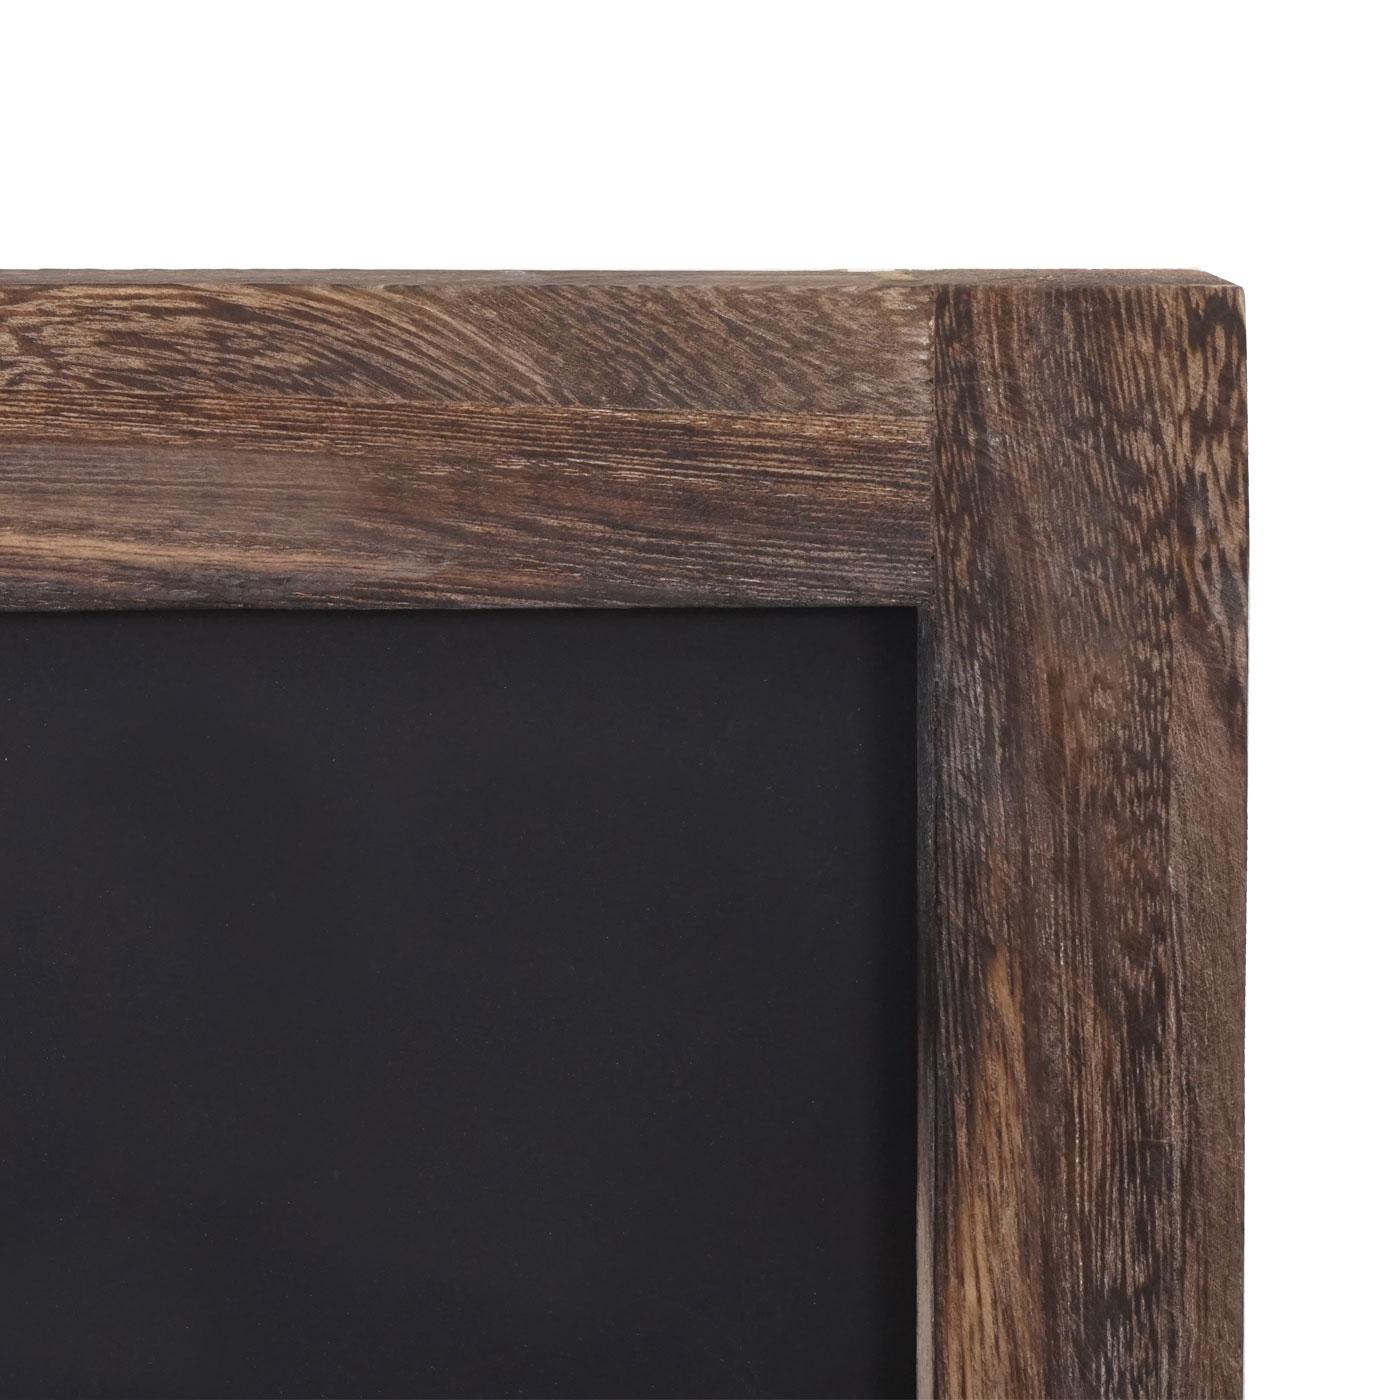 Detailbild Rahmen